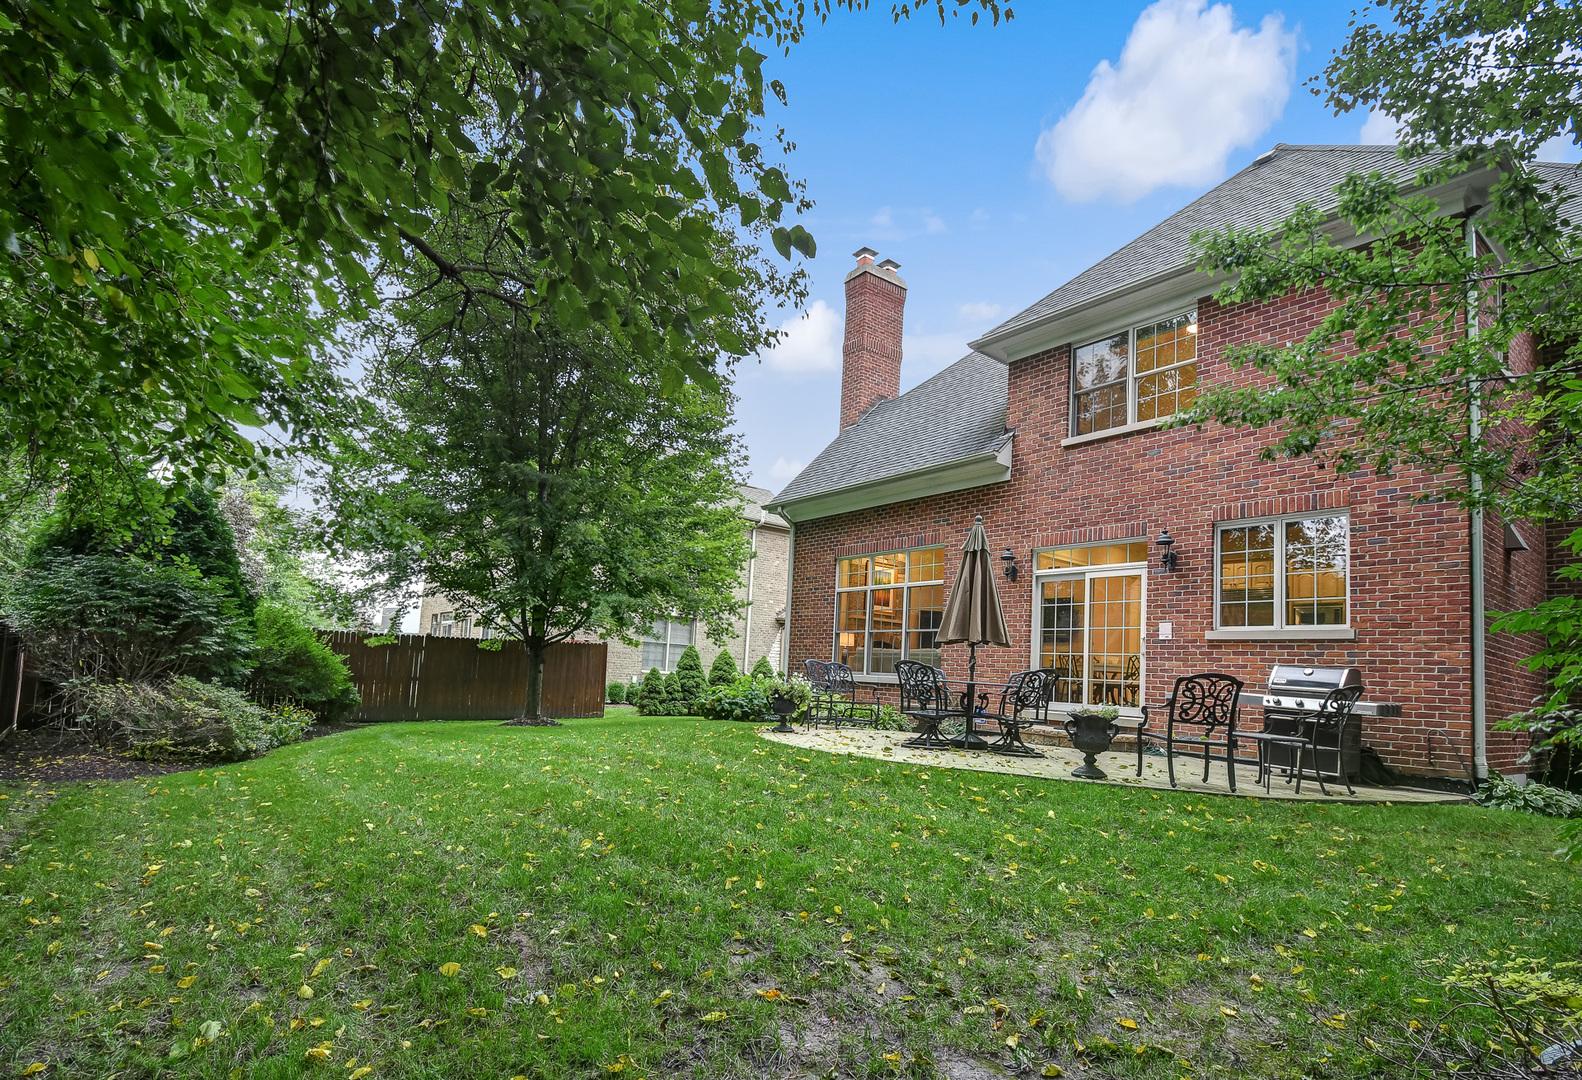 802 Franklin, Hinsdale, Illinois, 60521